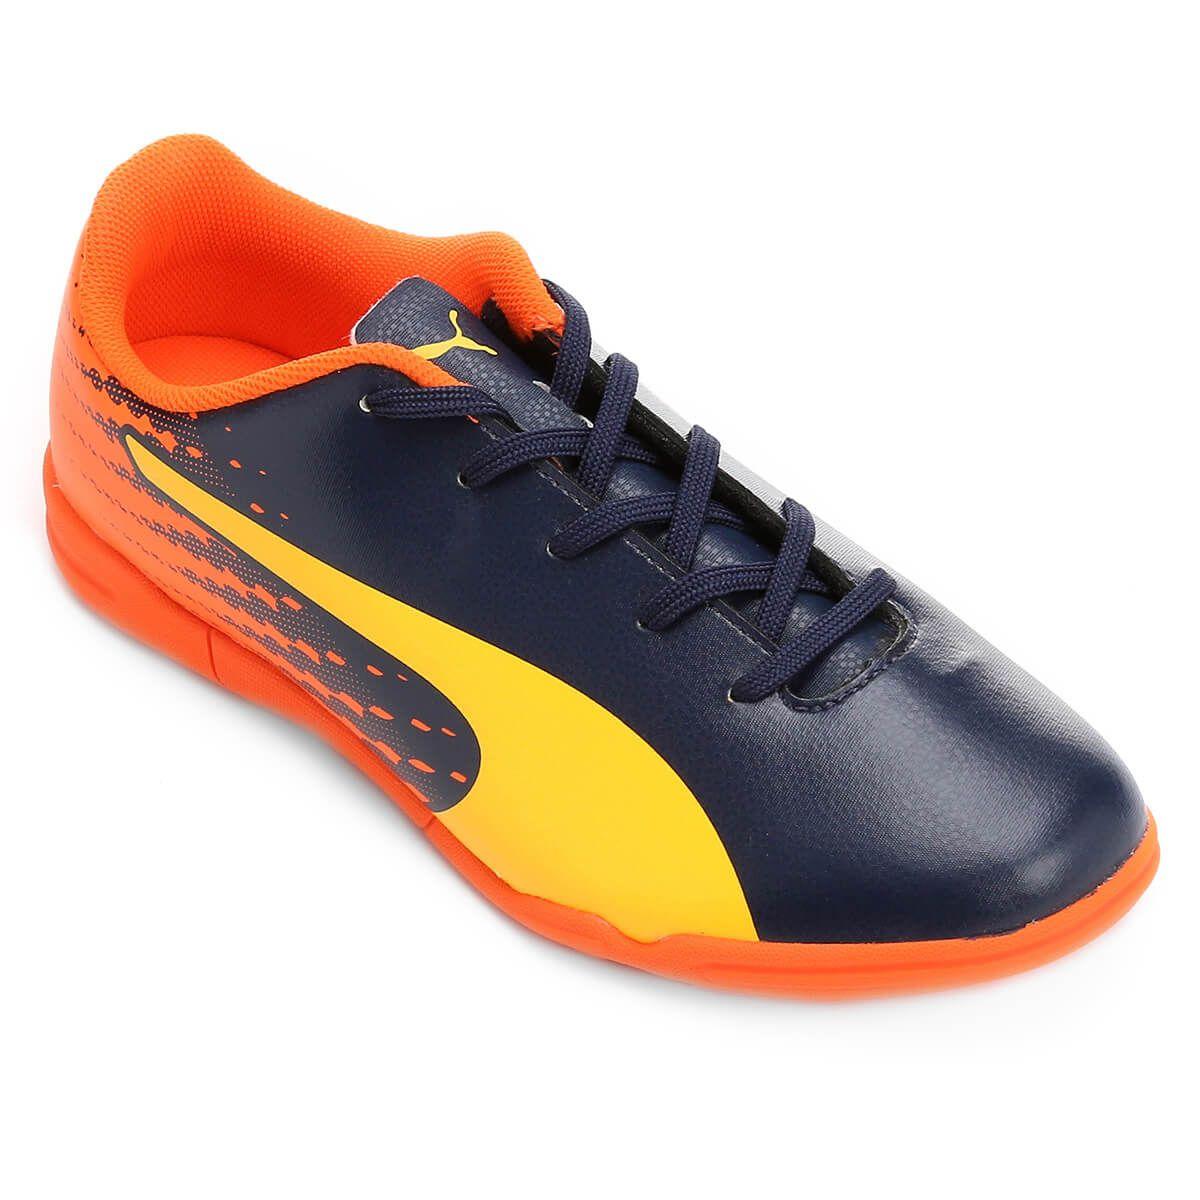 4140ca796b Tênis Masculino Futsal Puma linha Evospeed - BRACIA SHOP  Loja de ...